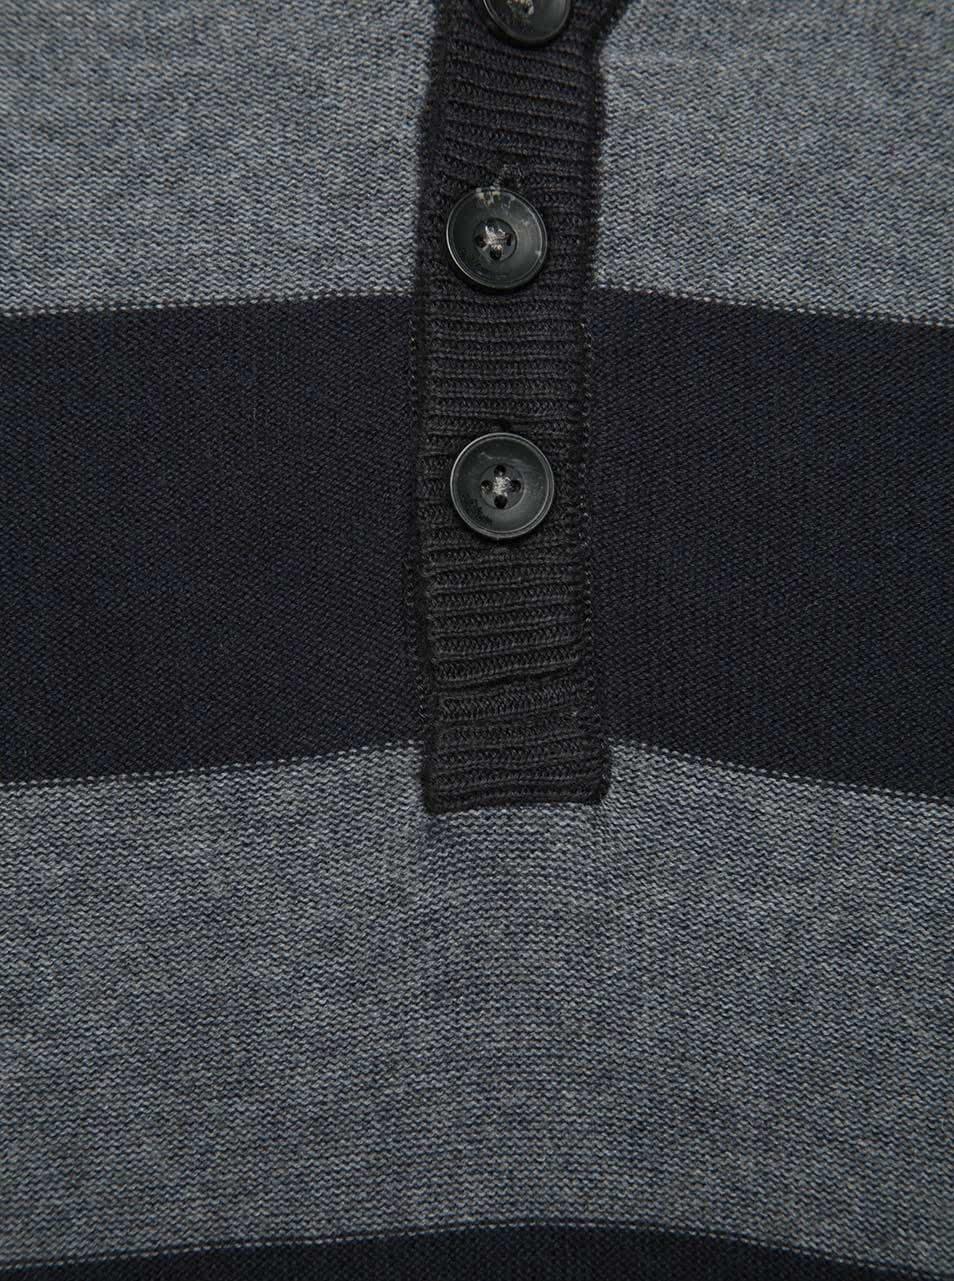 Šedo-černý pánský pruhovaný svetr s knoflíky s.Oliver  aff5c768b2